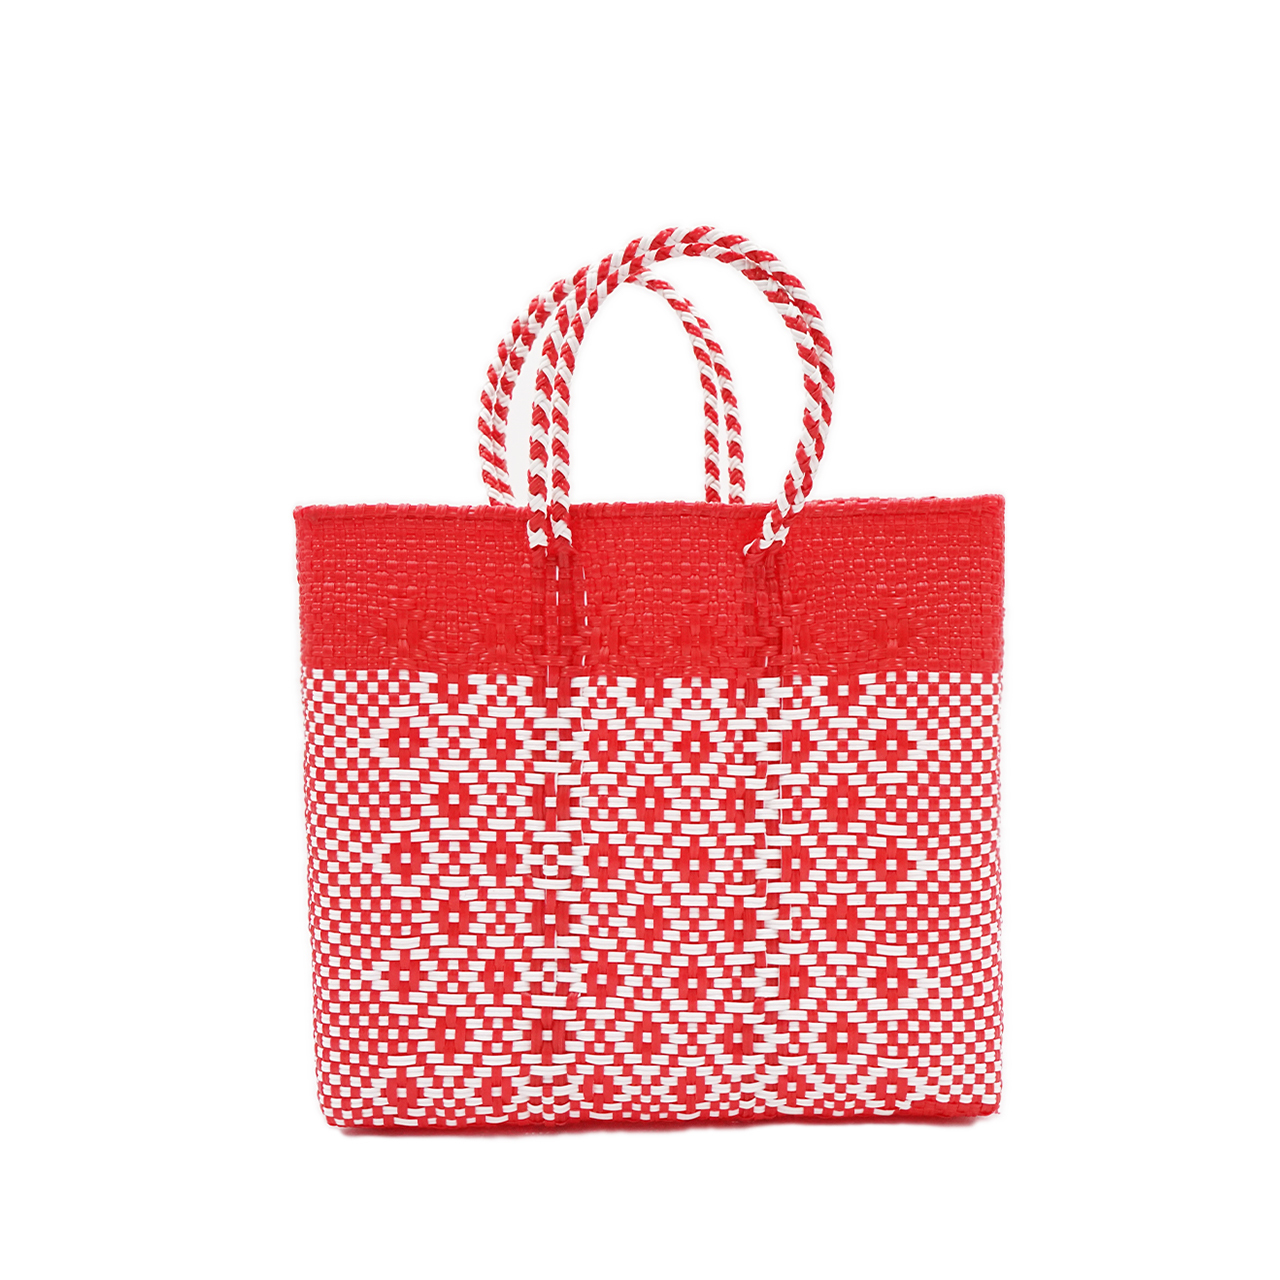 MERCADO BAG 2TONE - Red x Red (S)